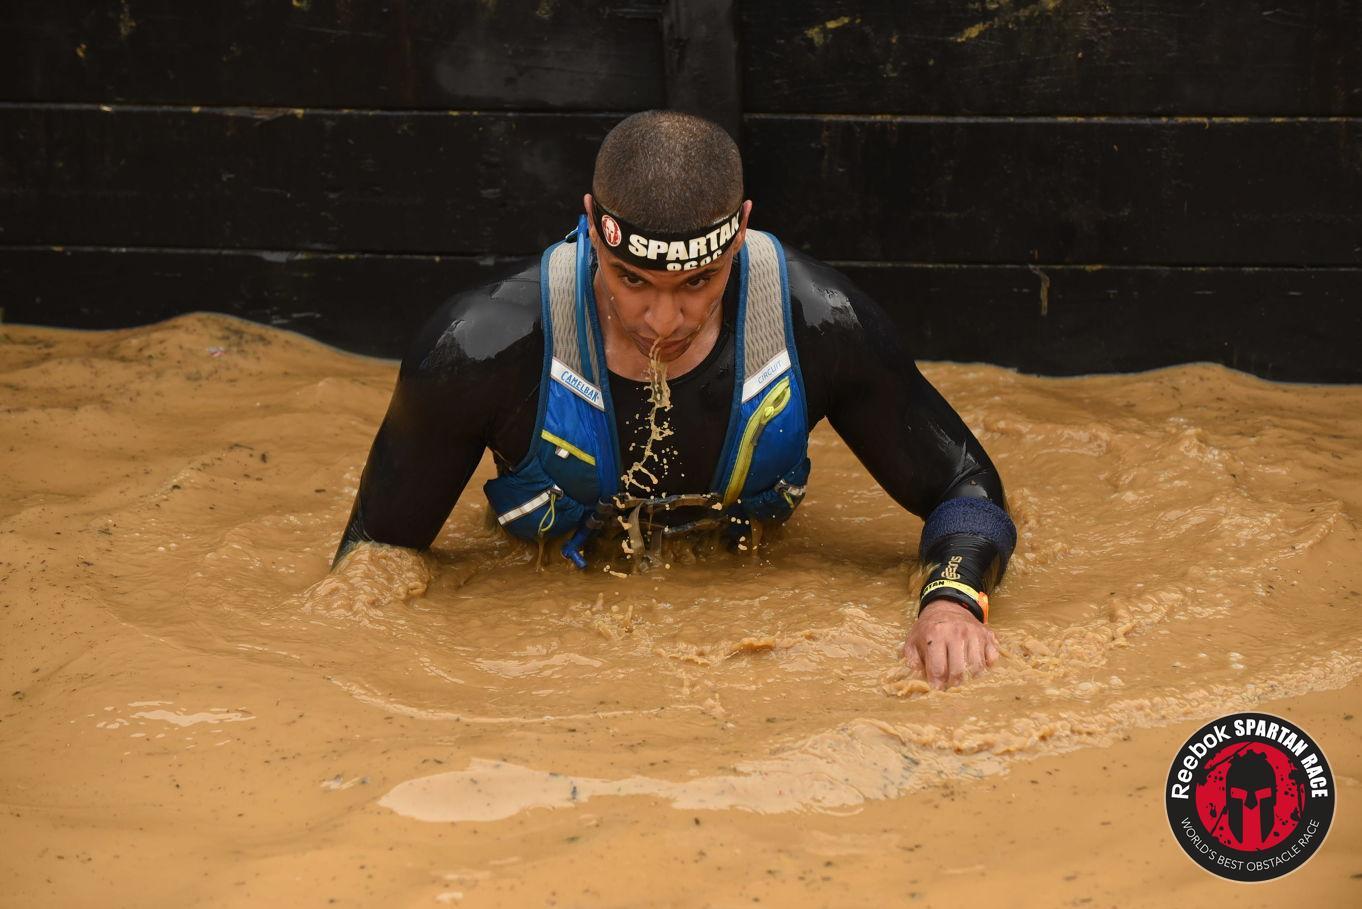 spartan-race-beast-nj-2017